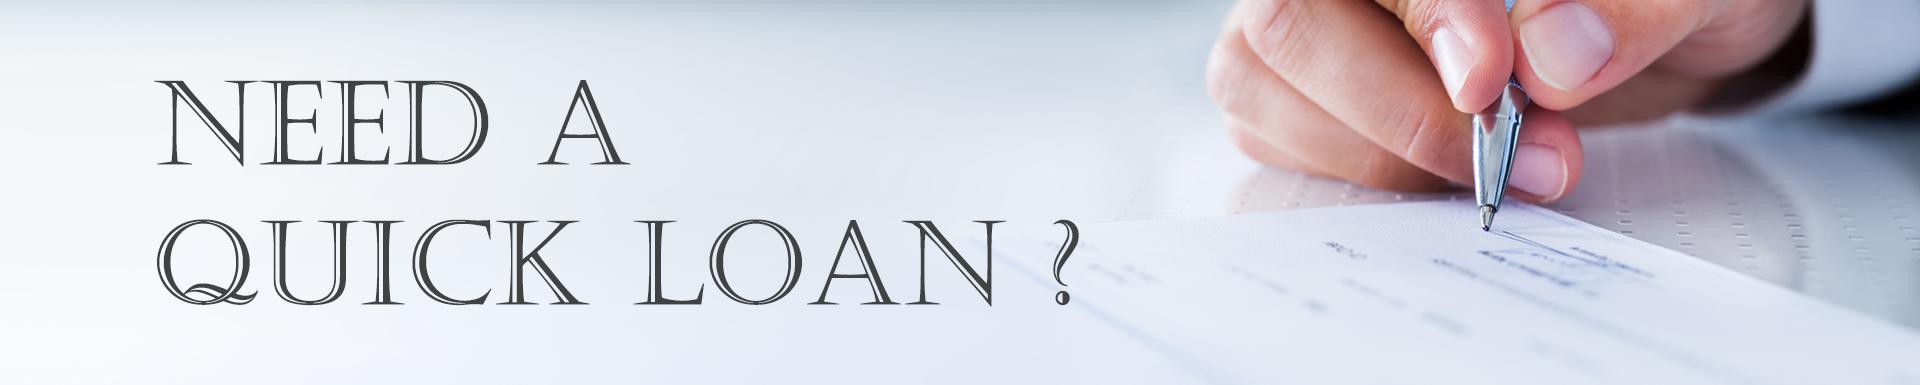 Need a new loan?